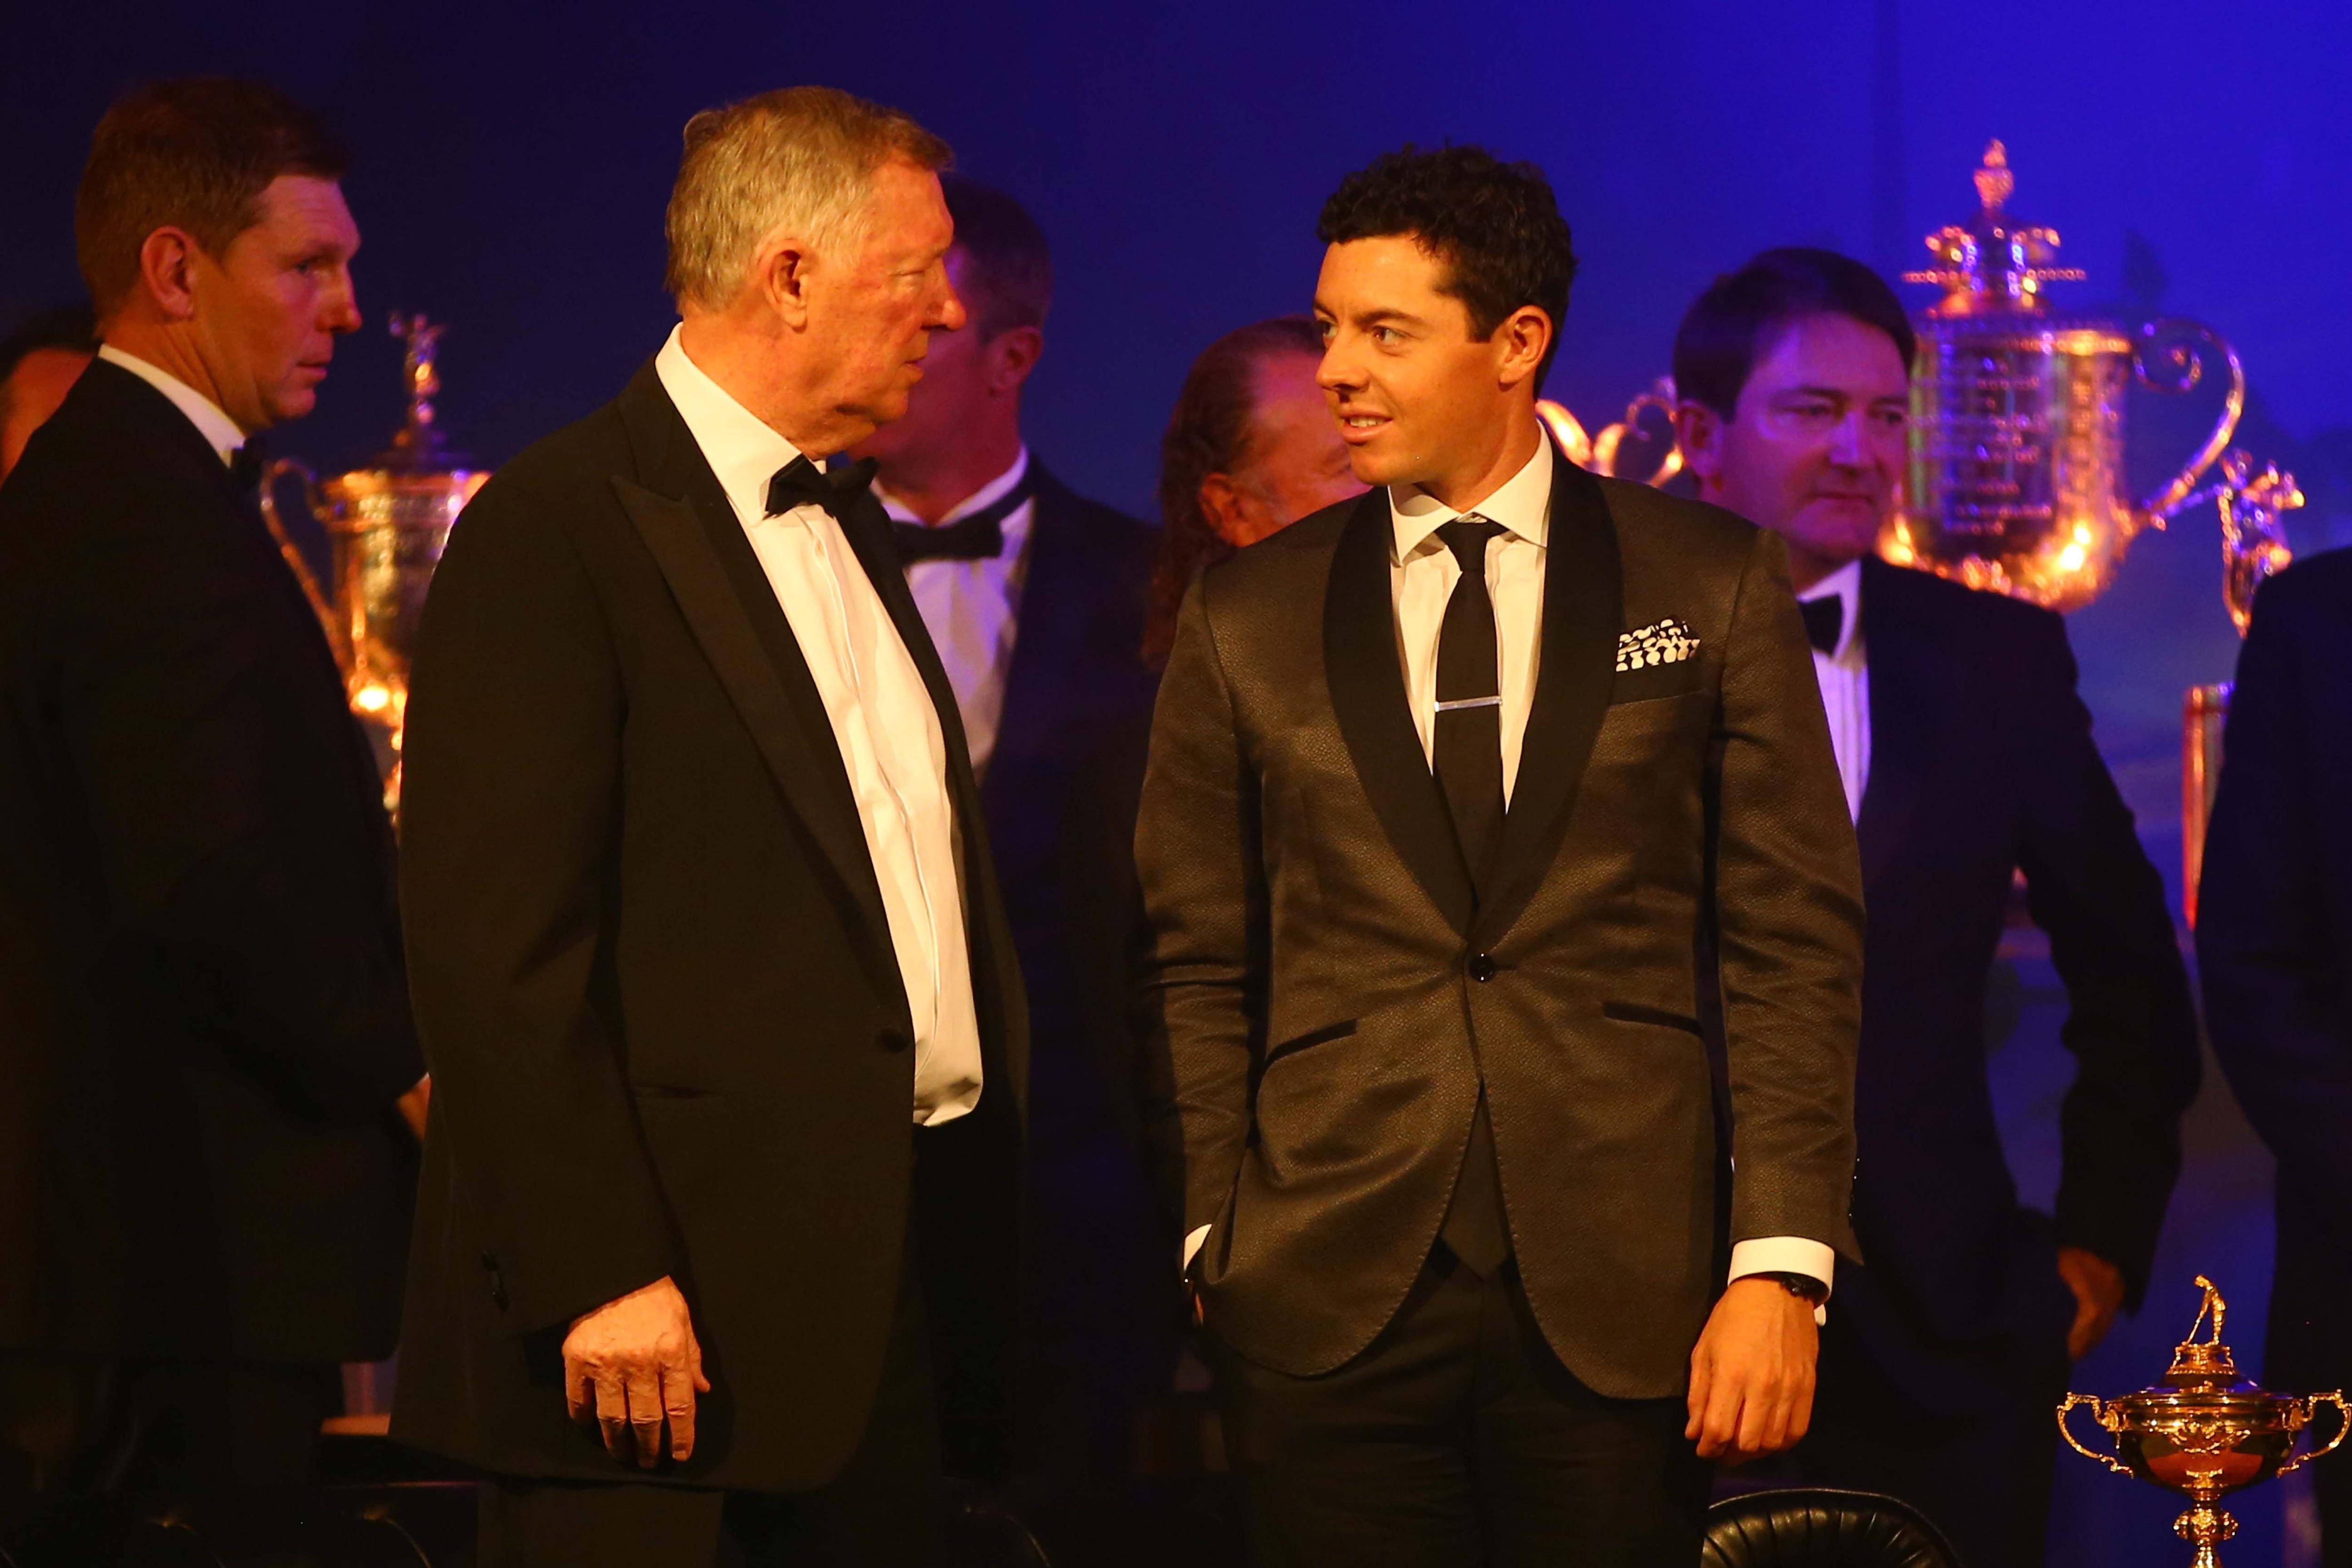 Sir Alex Ferguson and Rory McIlroy